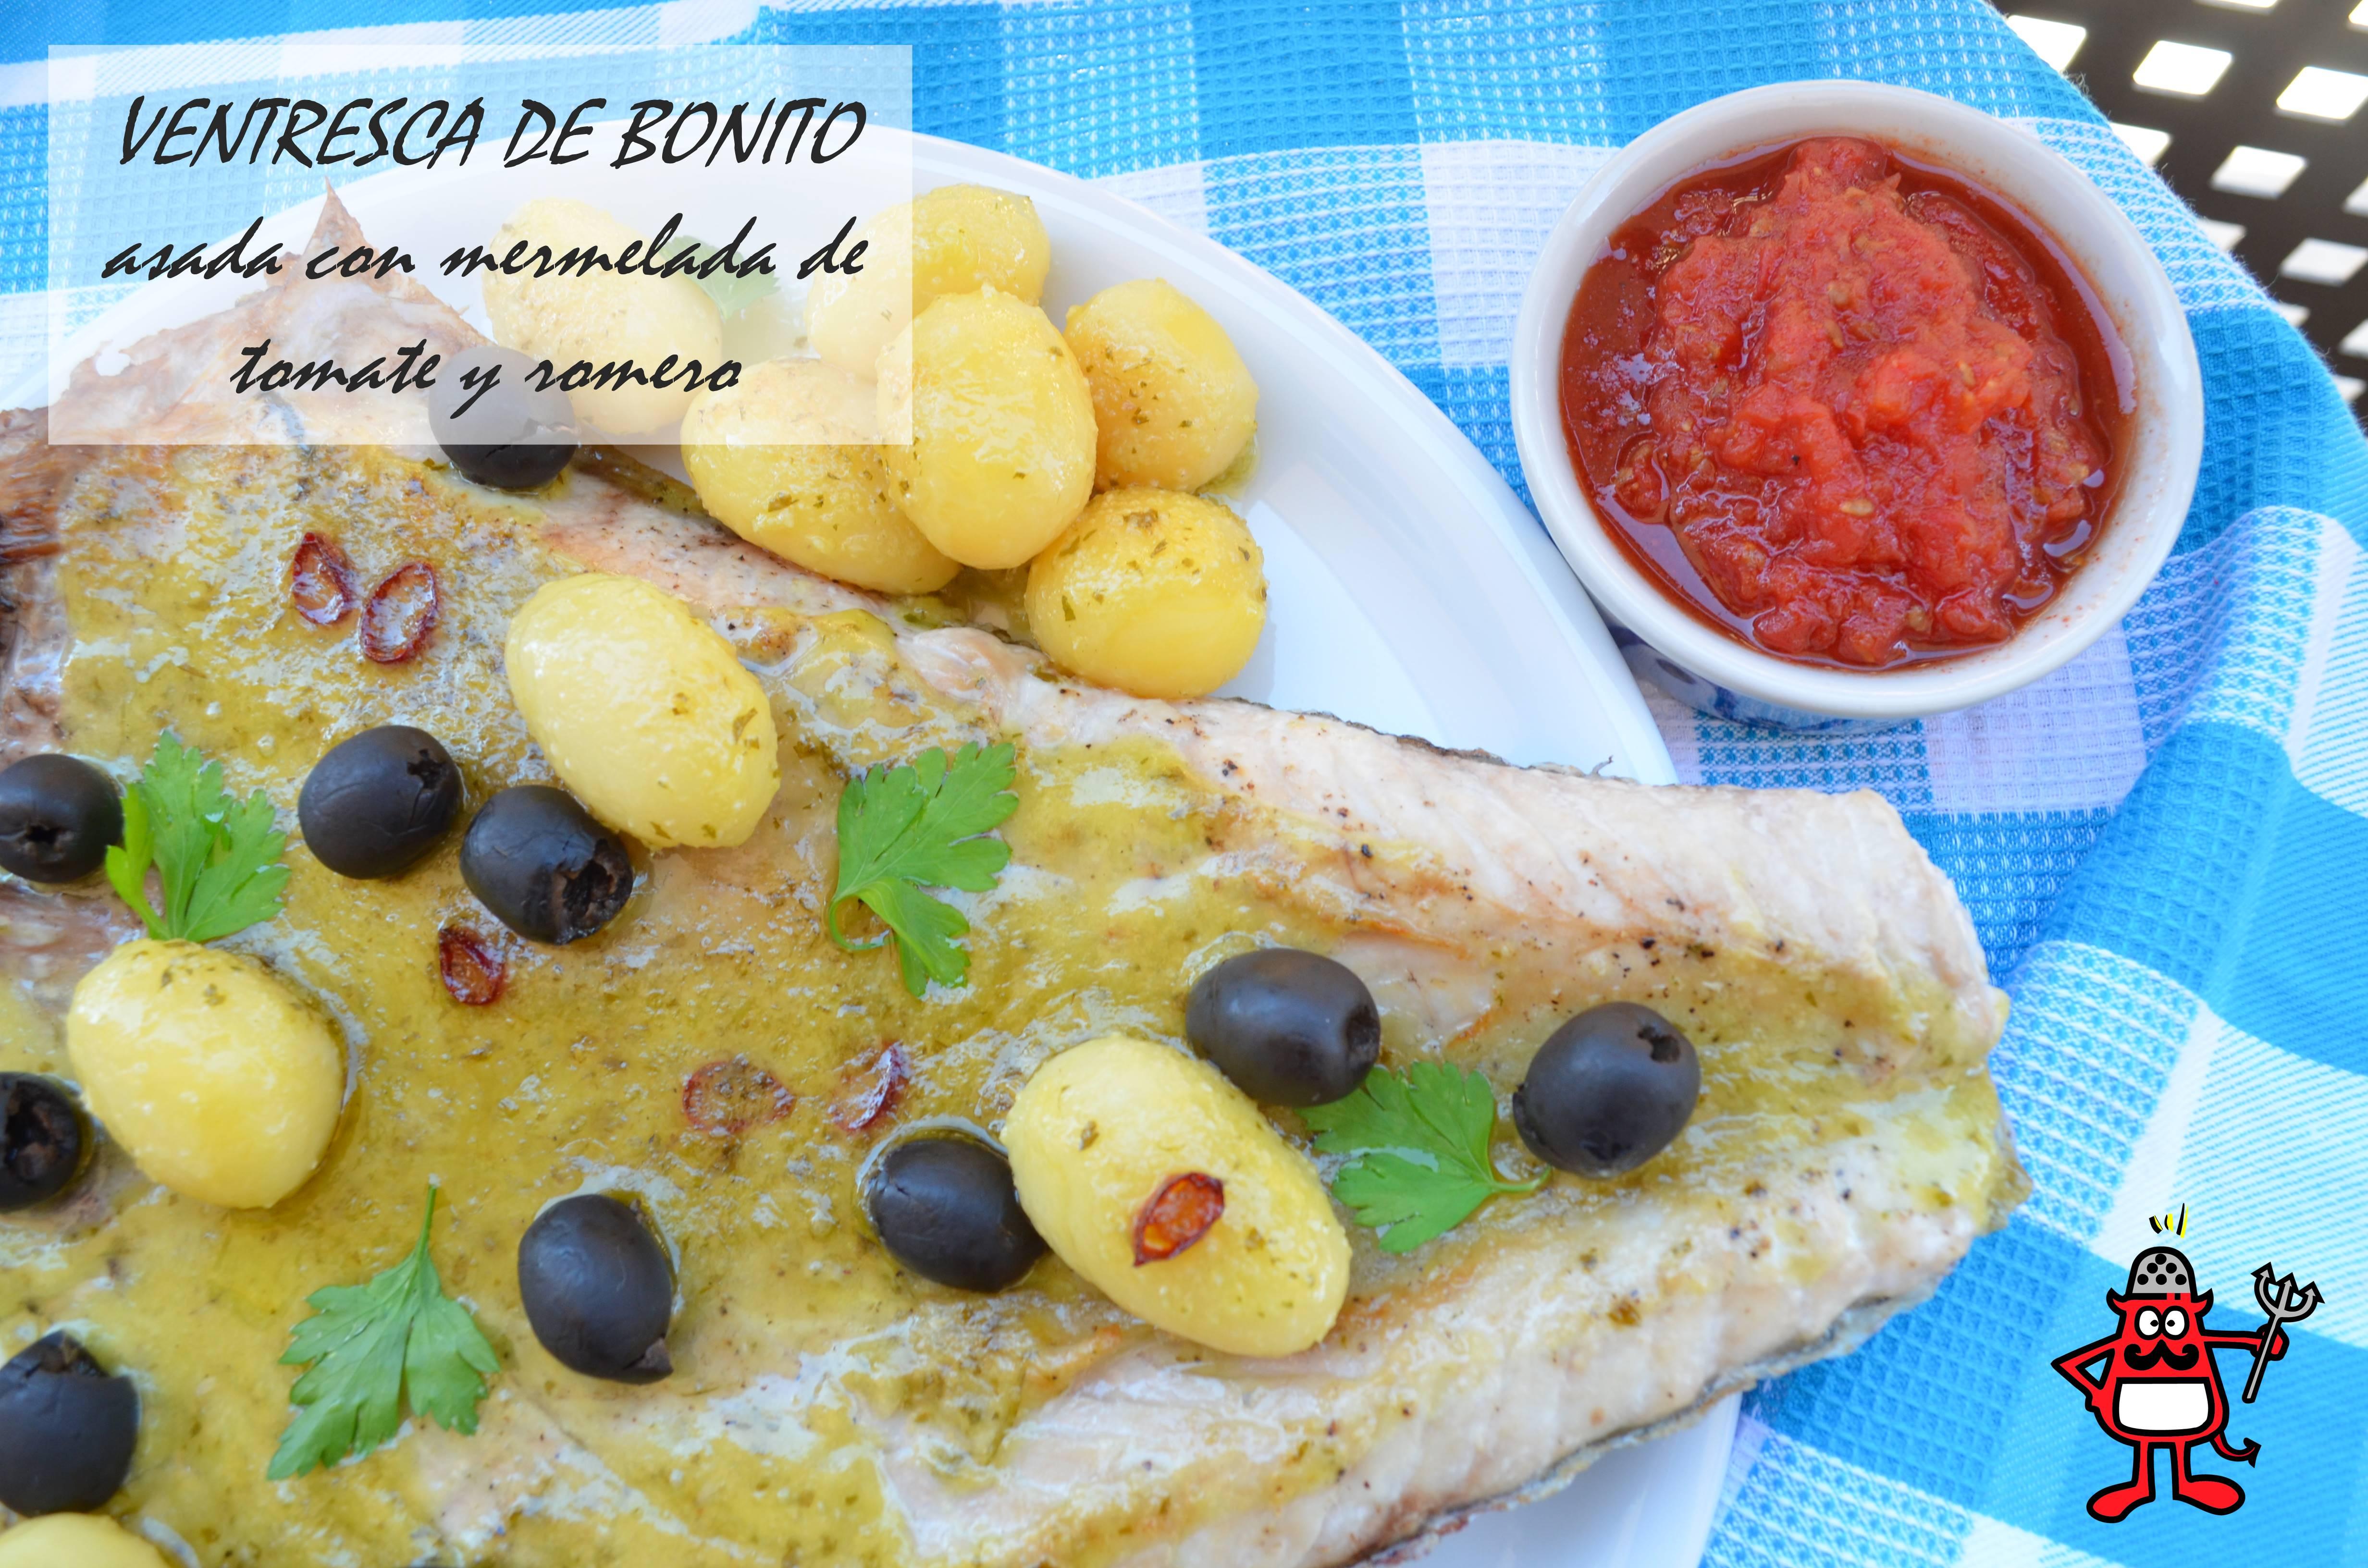 Ventresca_bonito_asada_mermelada_tomate_romero_1